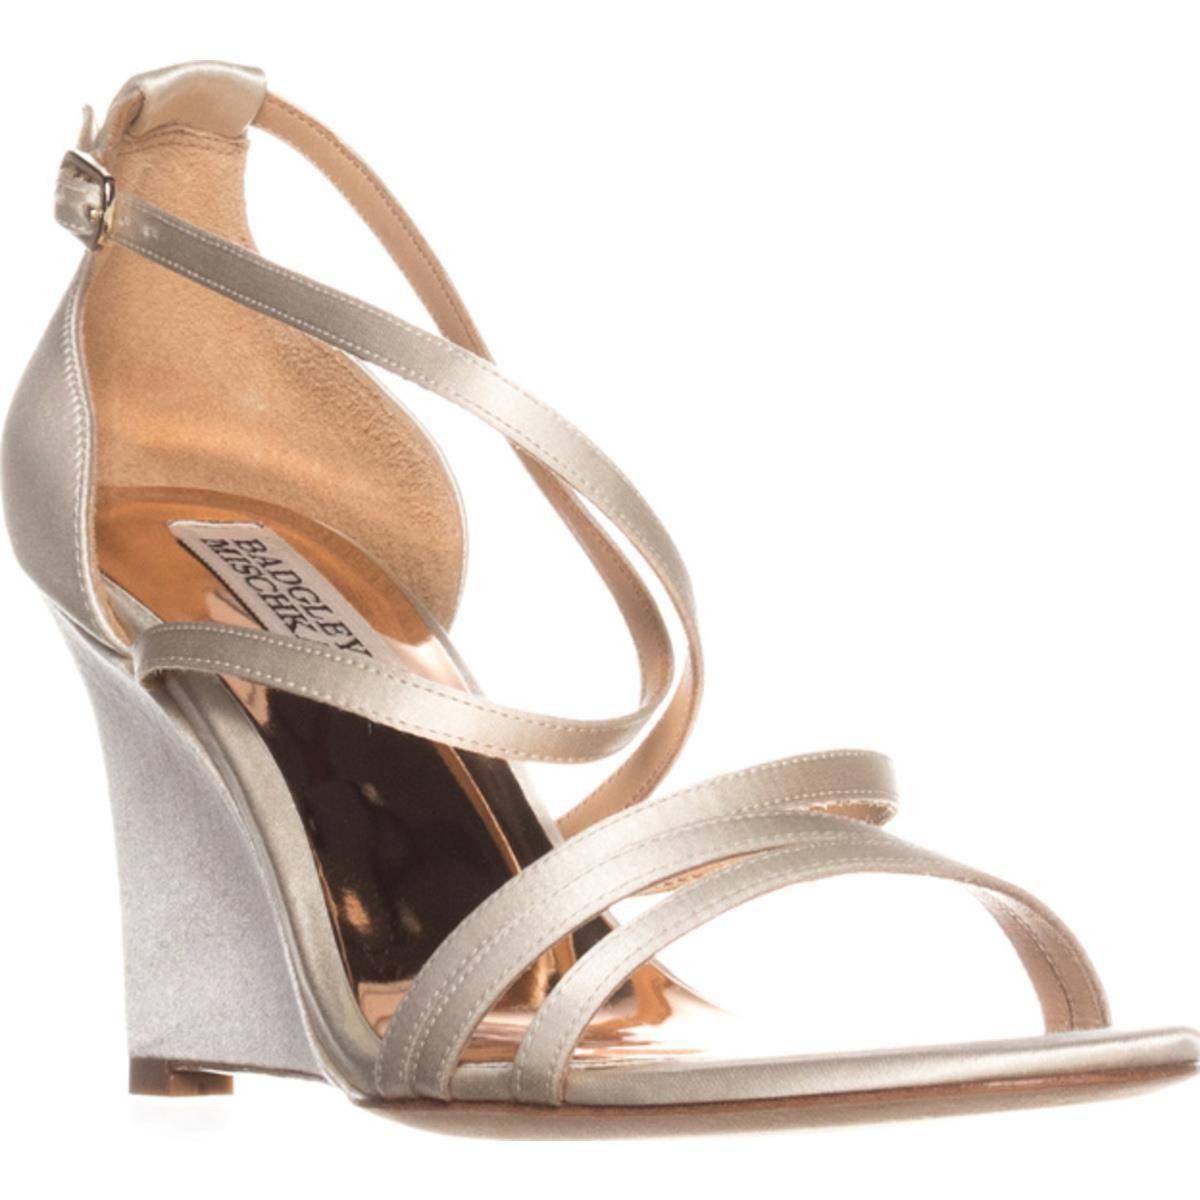 b2e7cd6f03 Lyst - Badgley Mischka Bonanza Wedge Evening Sandals in White - Save 14%